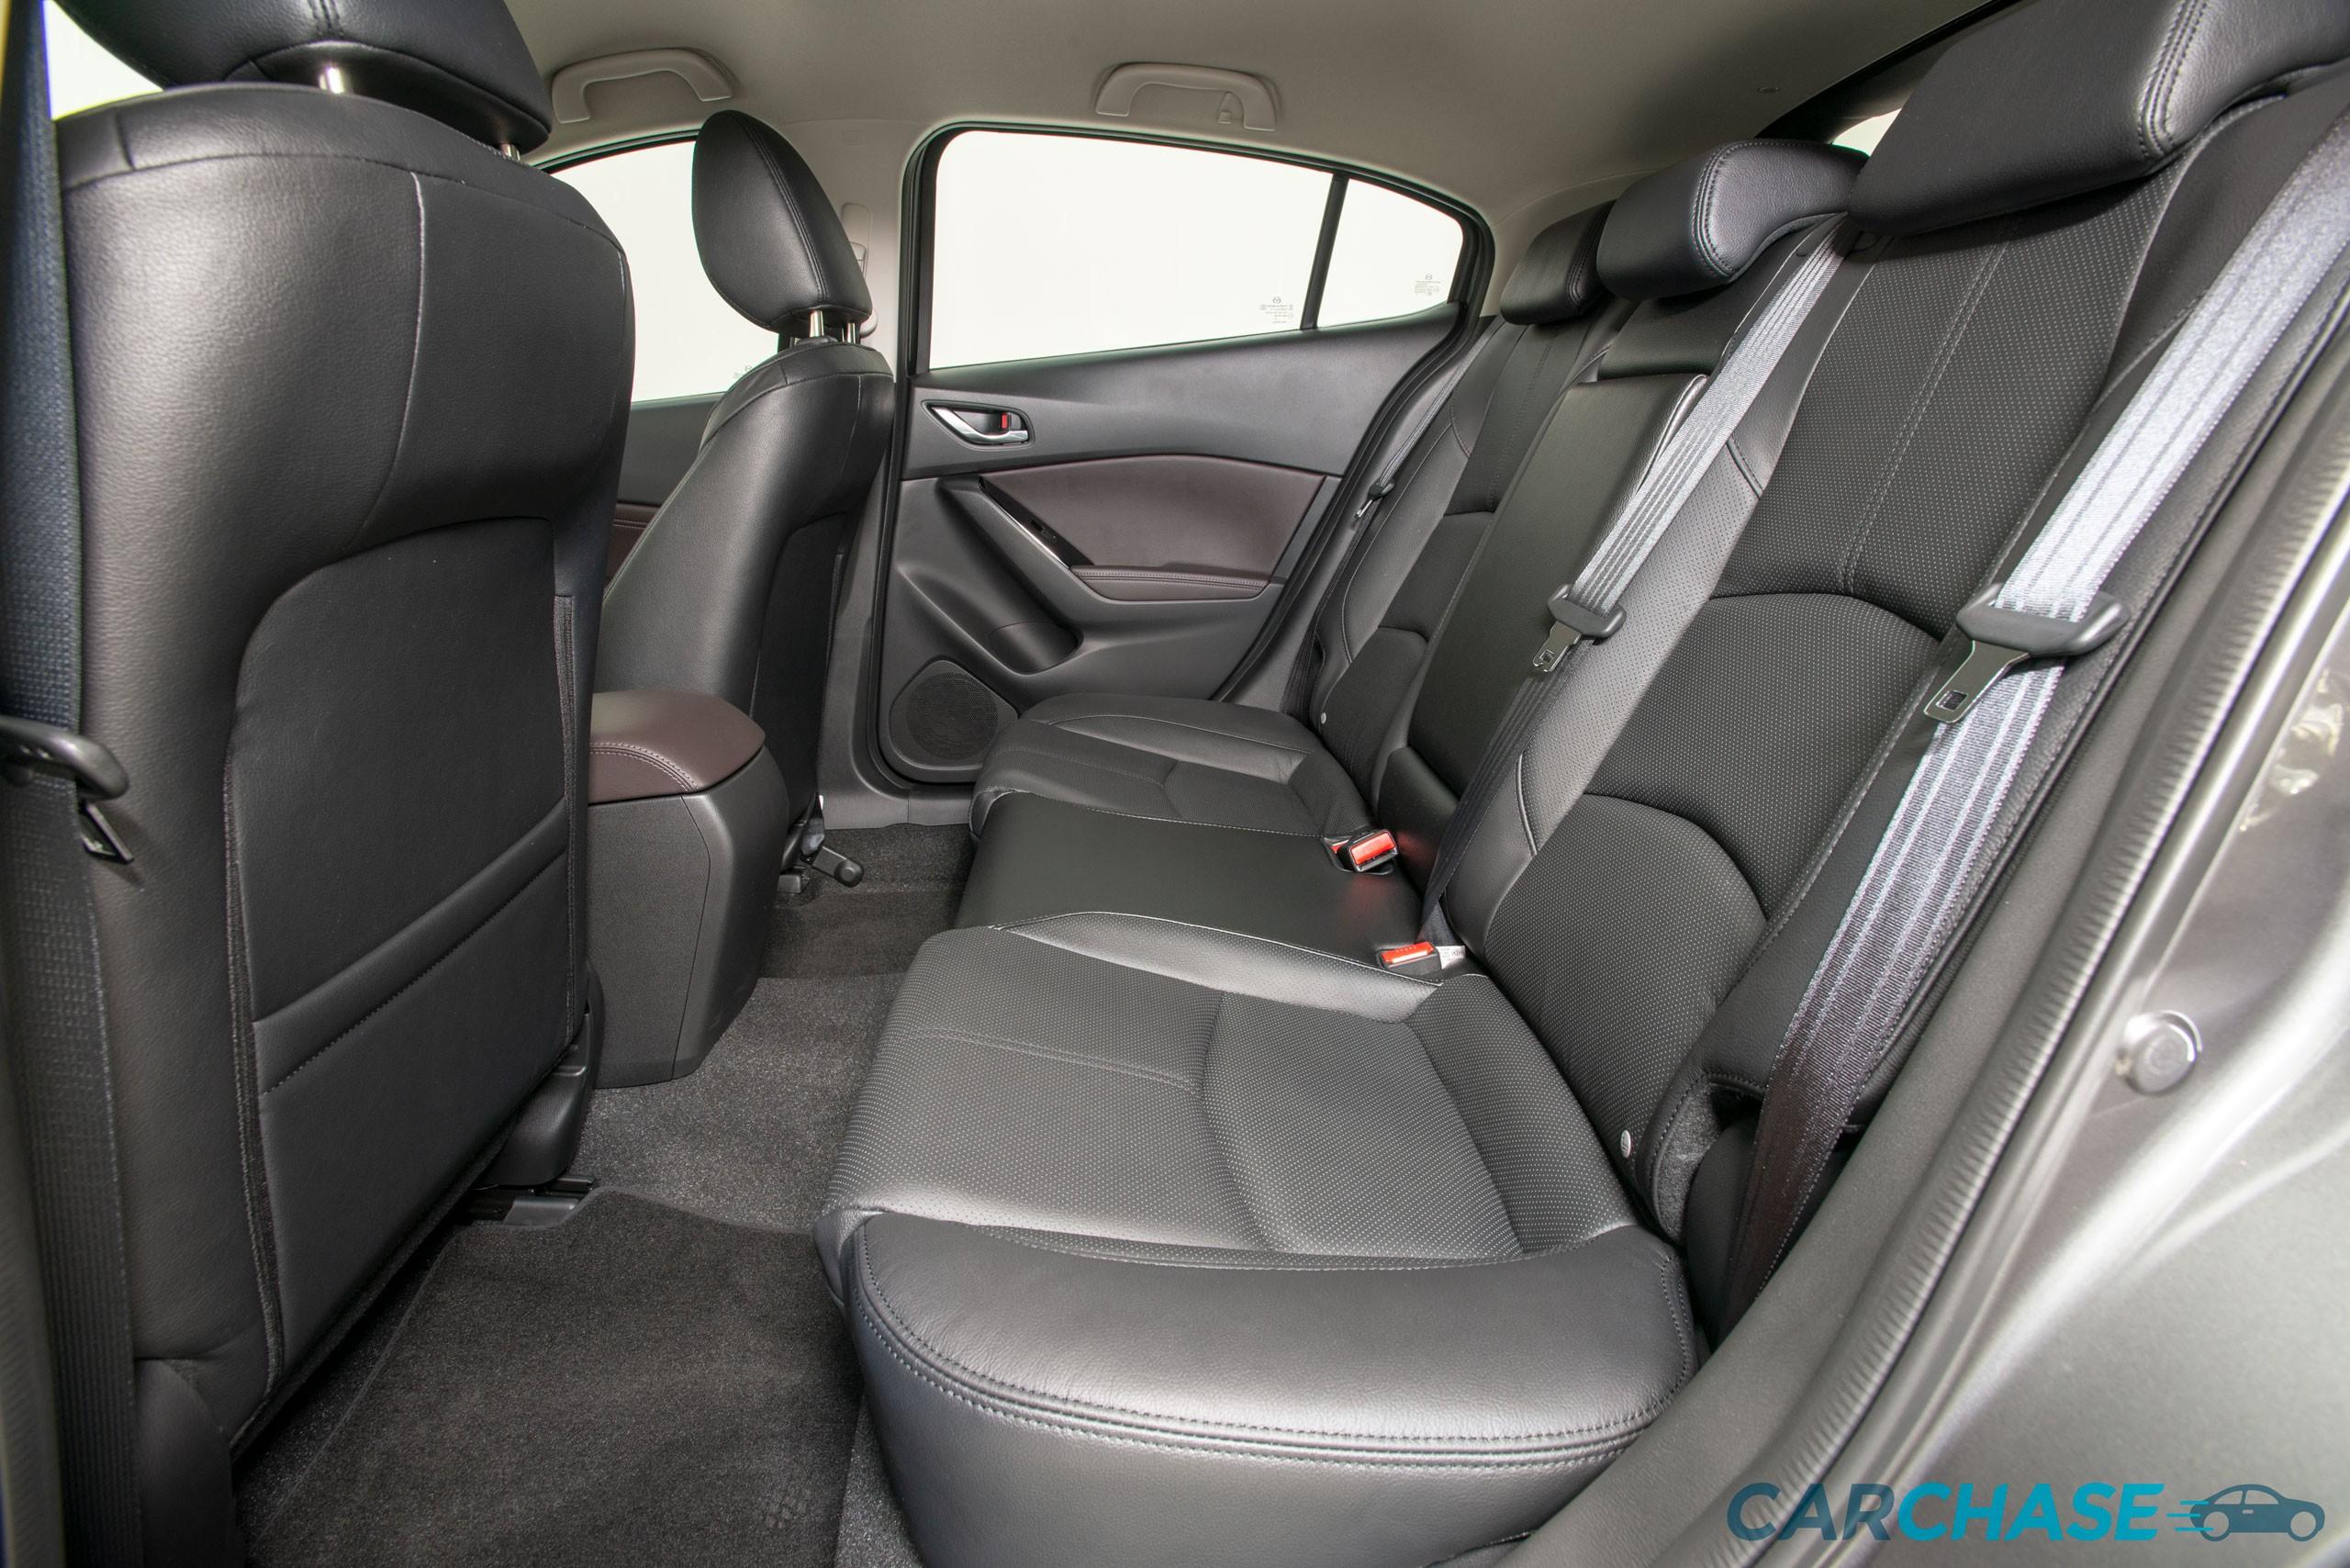 Image of passenger rear profile of 2018 Mazda 3 SP25 GT